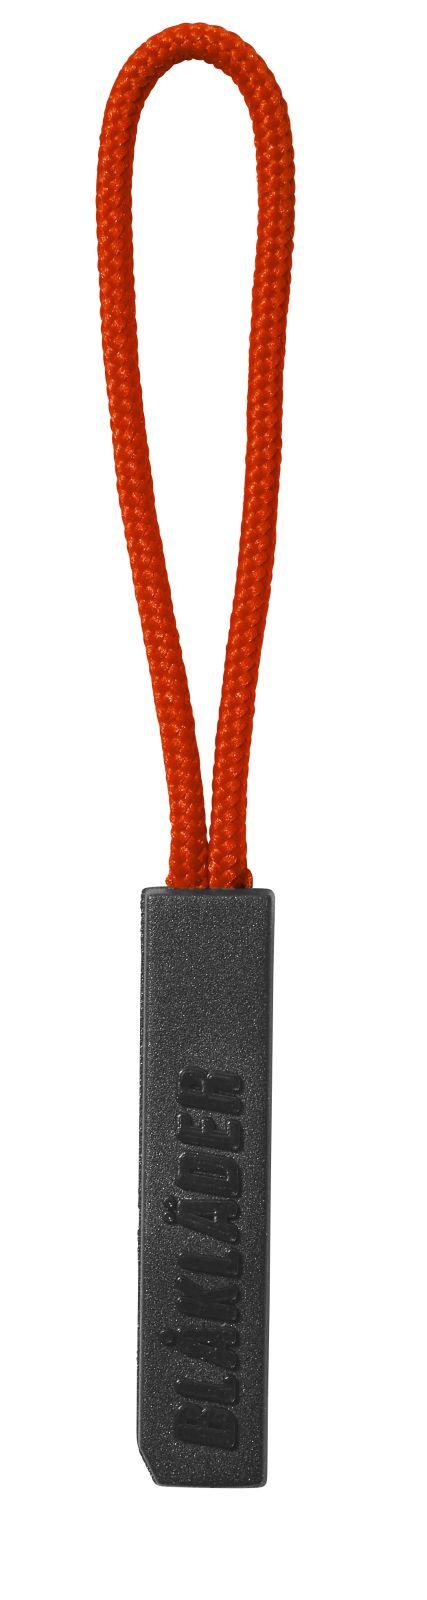 Blaklader Rits puller 21550000 fluo-rood(5500)